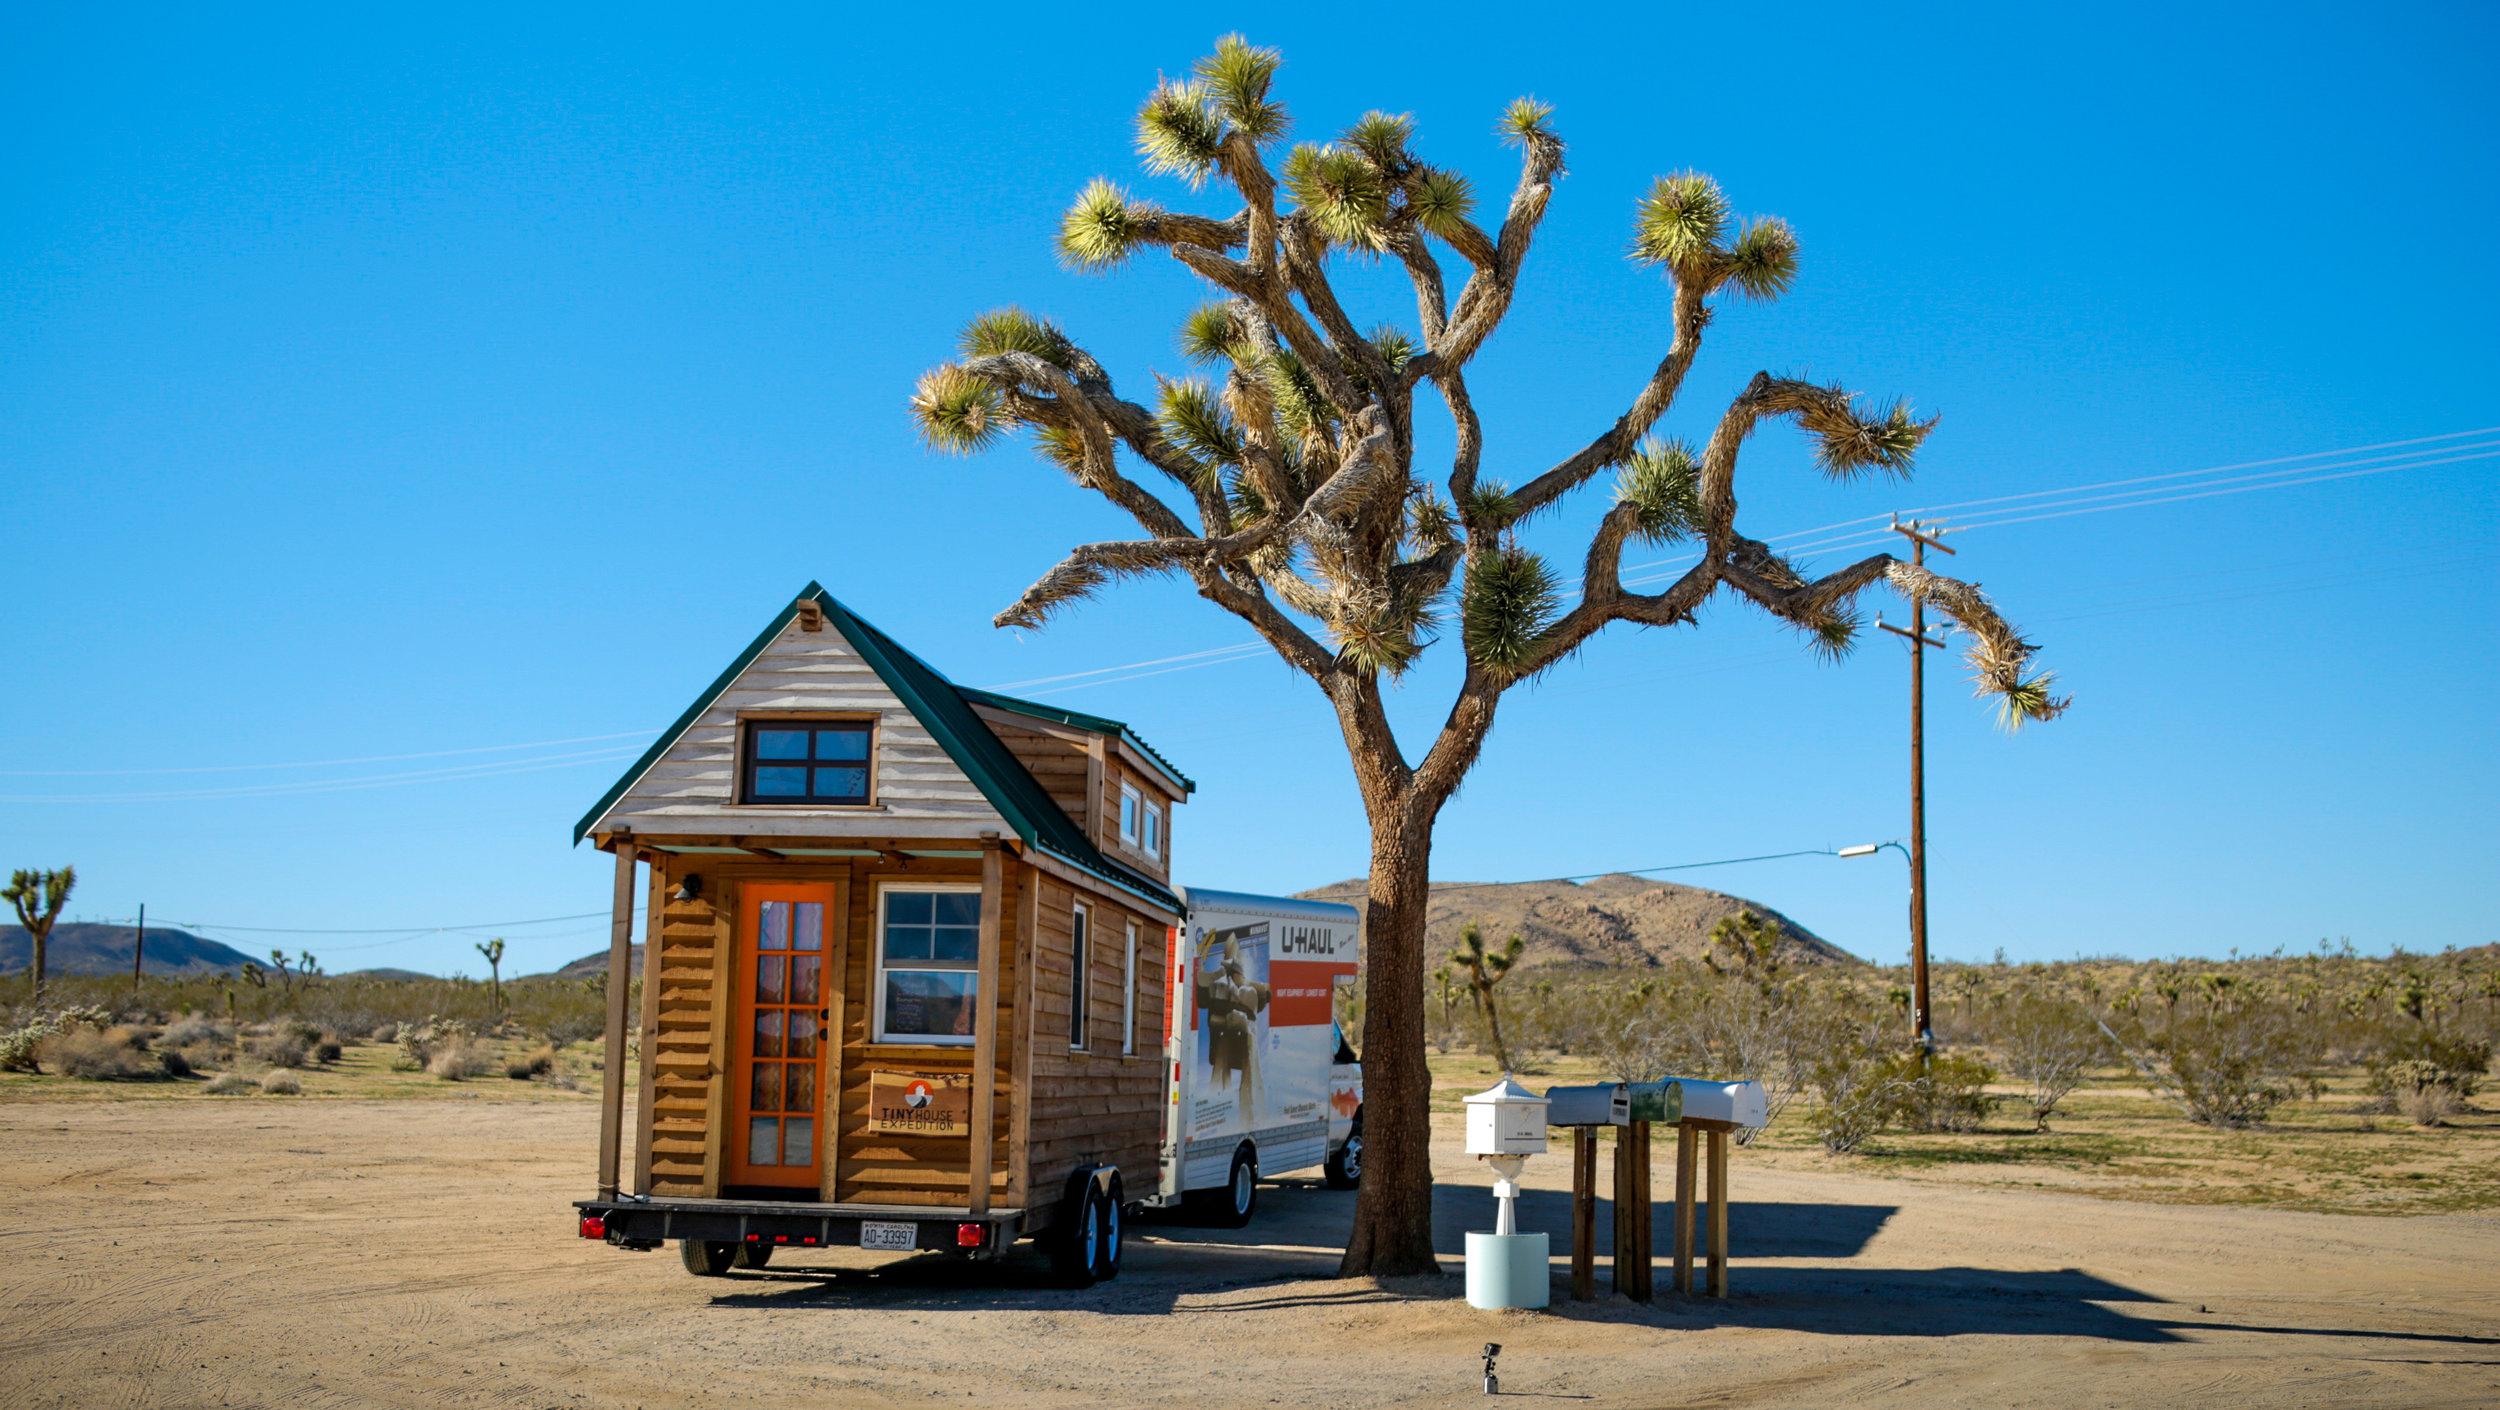 Road Trip Inspiration - visit our Pinterest Page!